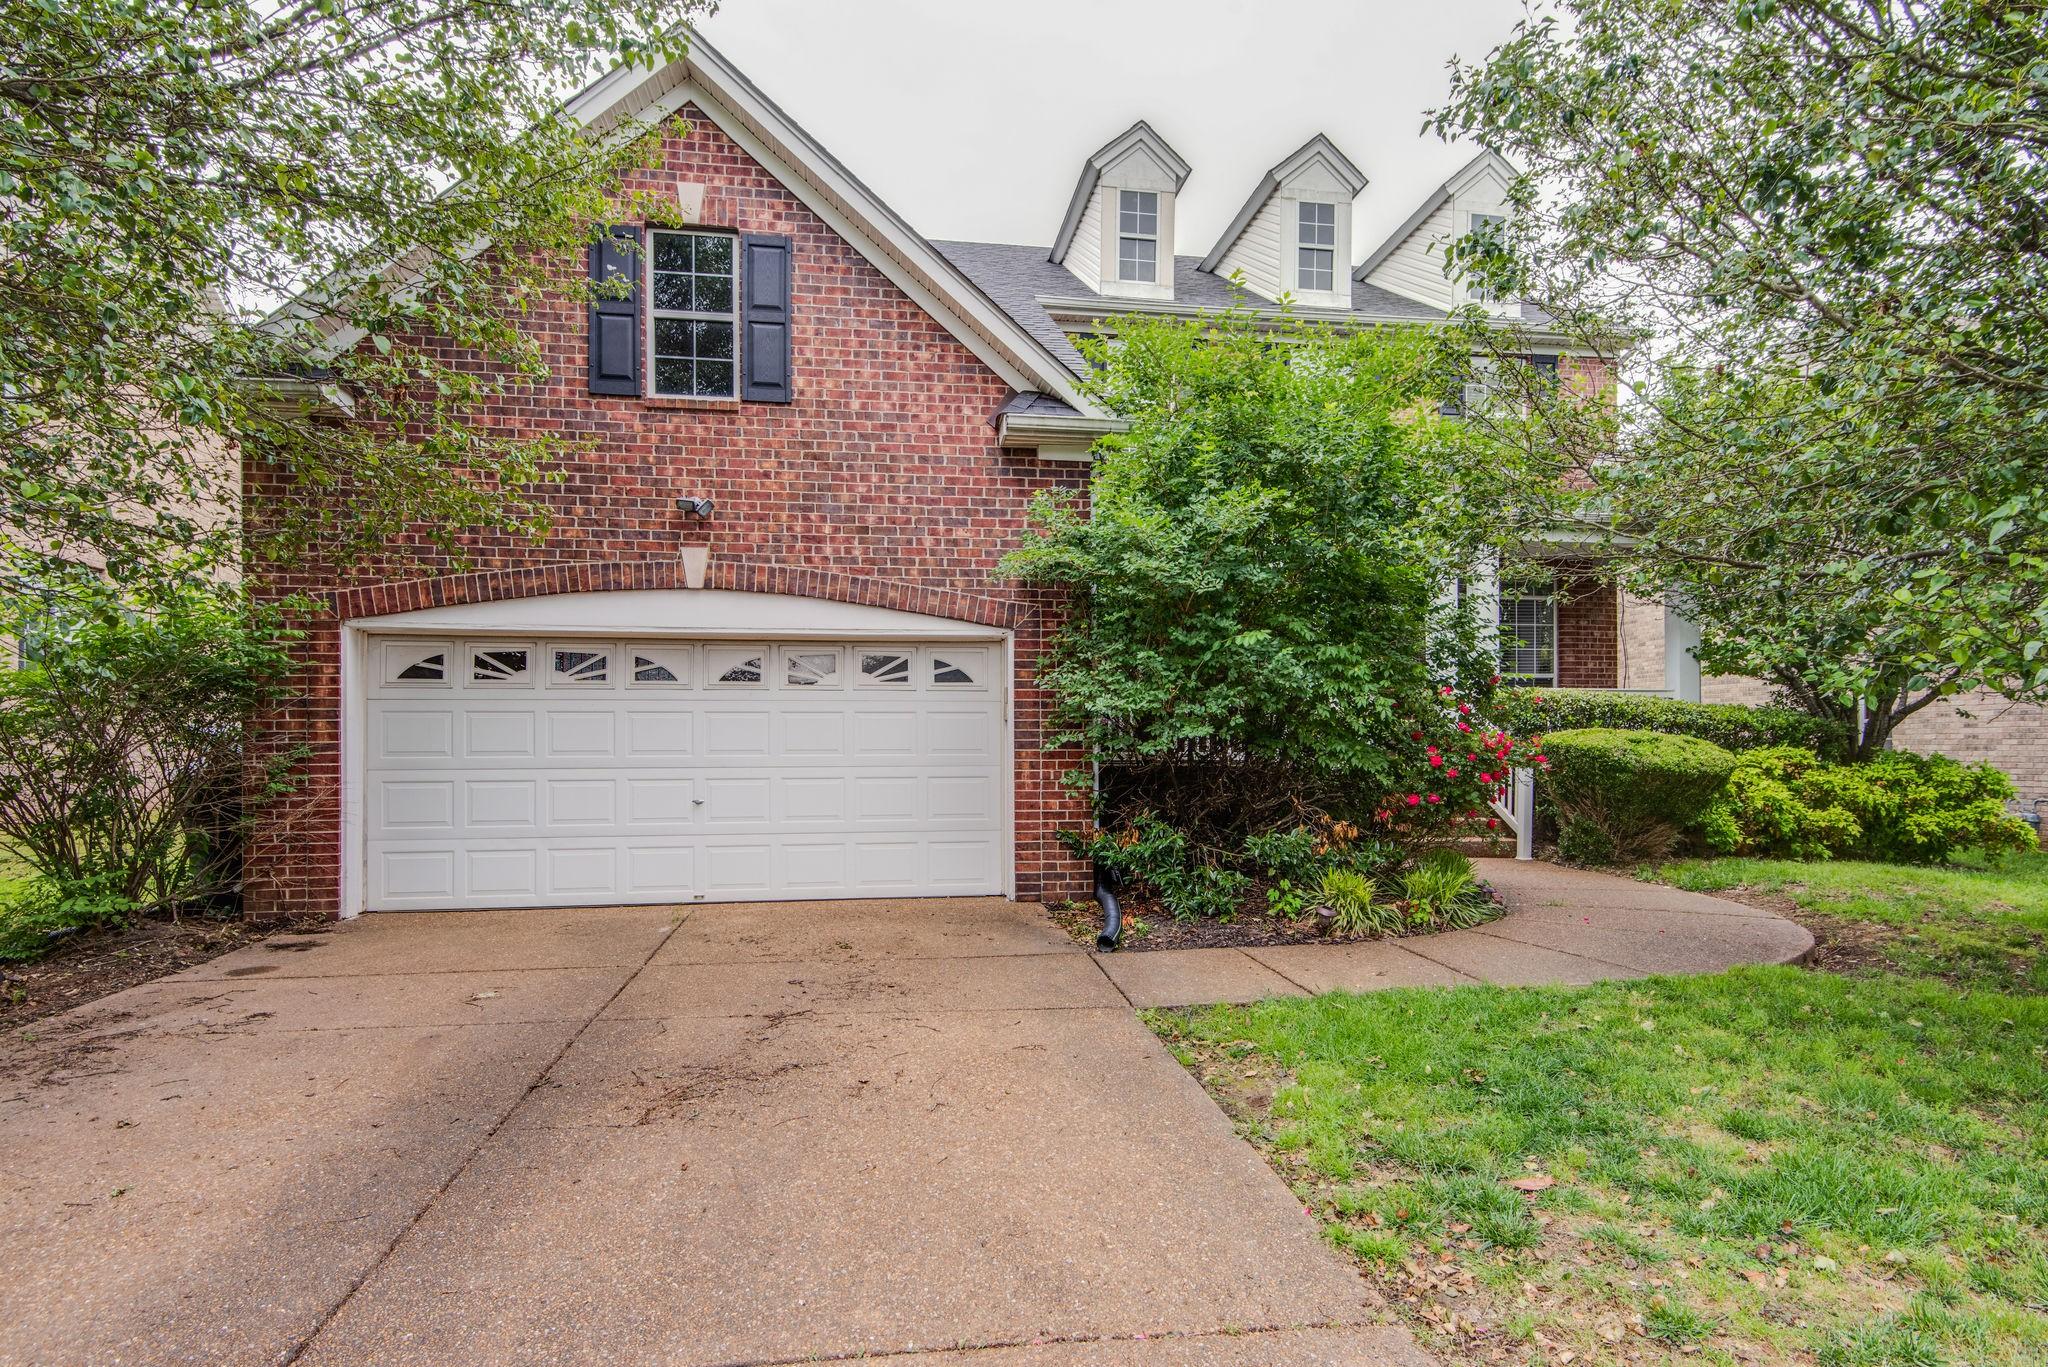 204 Wisteria Dr, Franklin, TN 37064 - Franklin, TN real estate listing